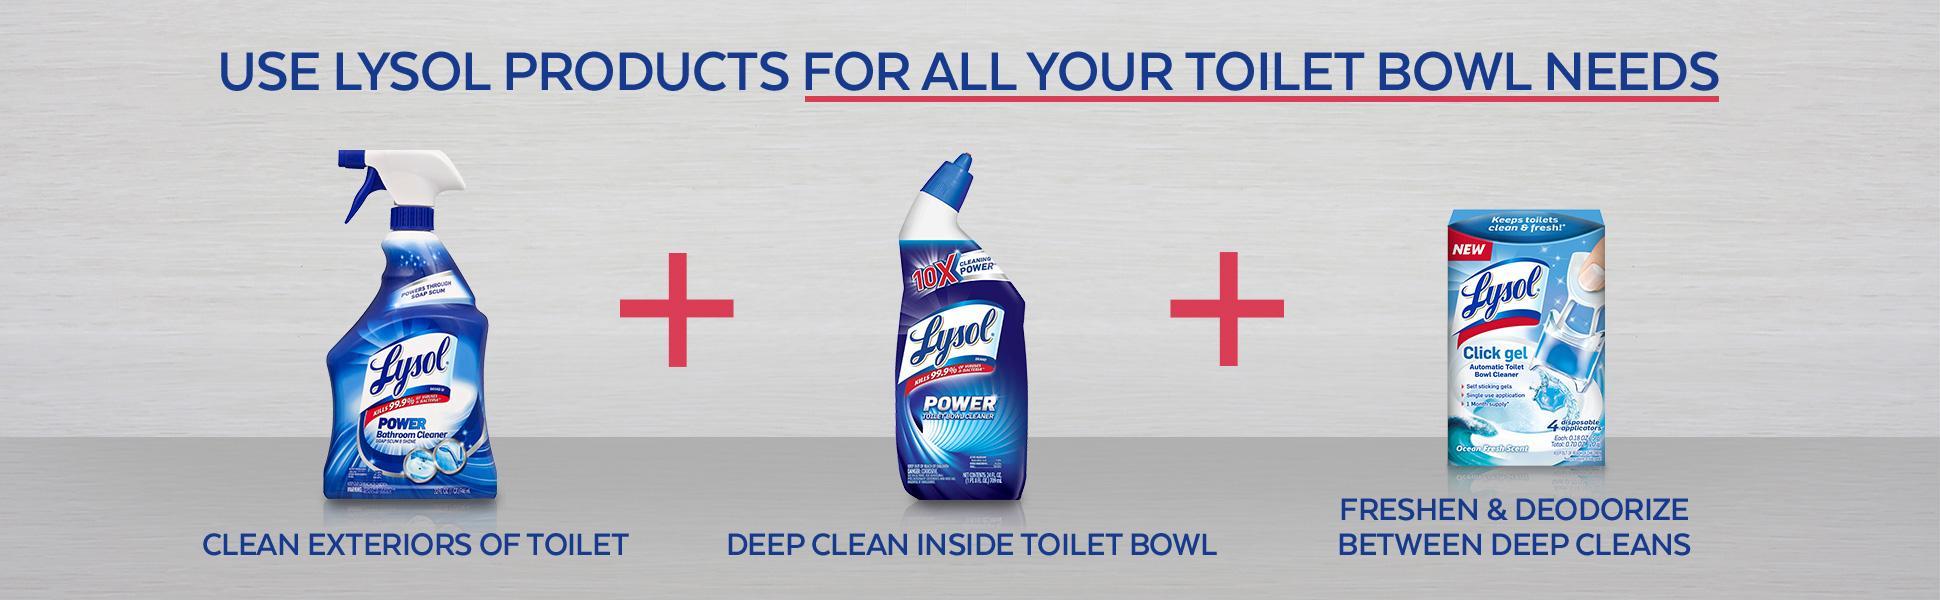 Lysol Action Gel Toilet Bowl Cleaner